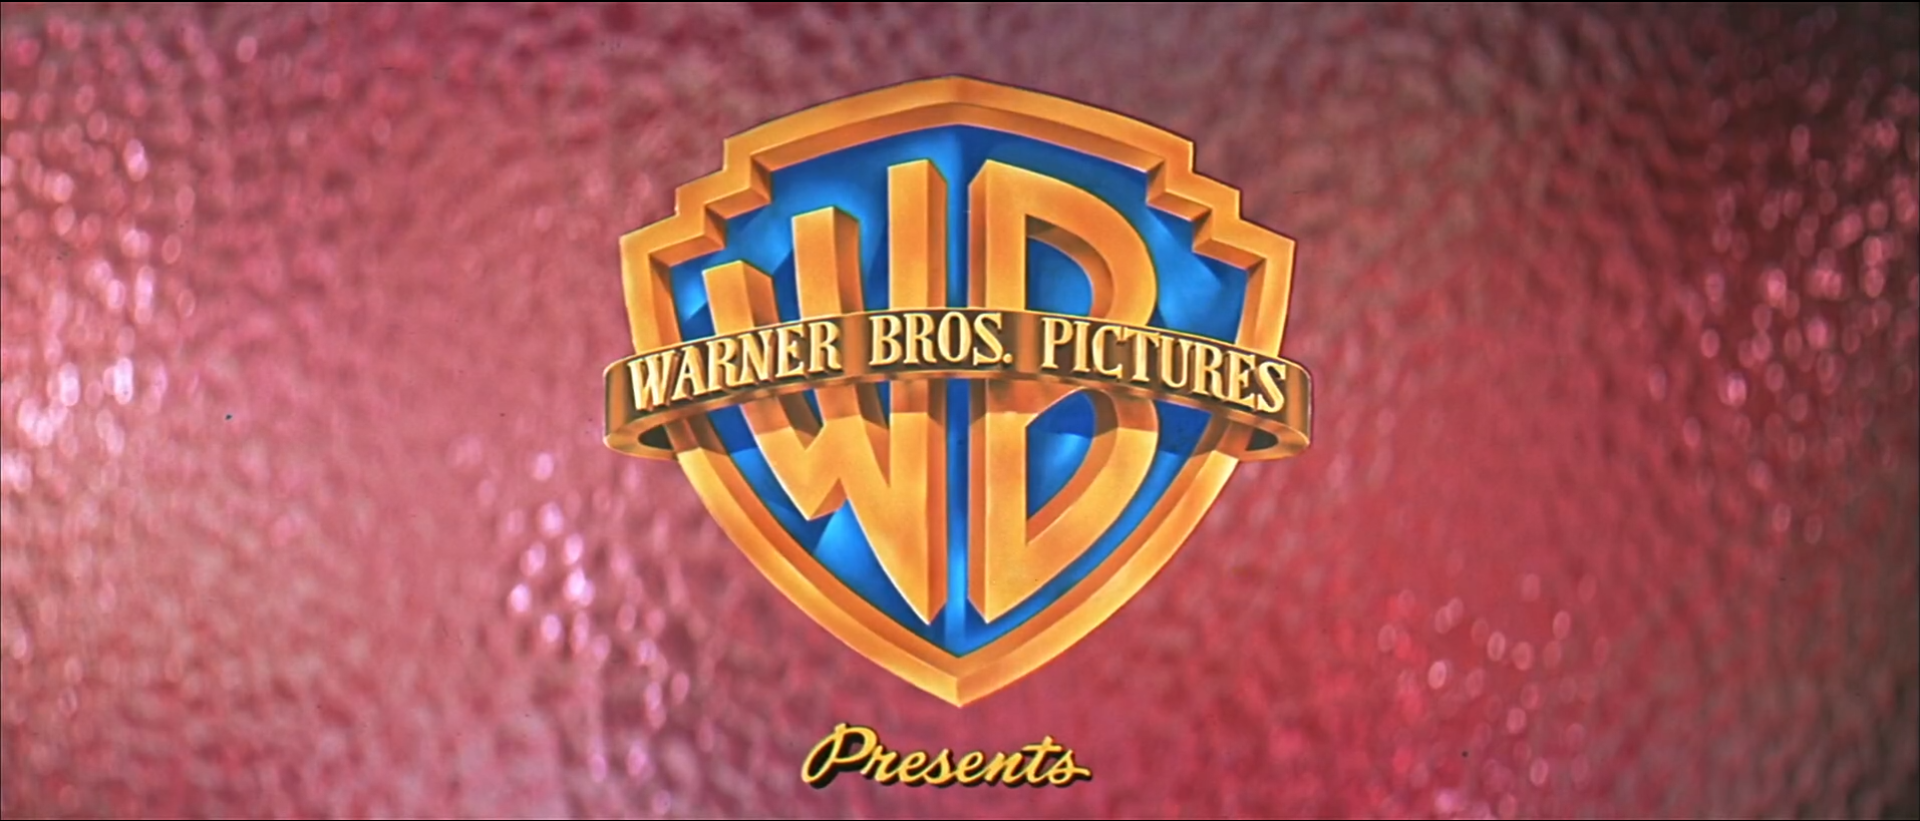 Original Period Opening Logos Yay Looney Tunes Show Warner Bros Logo Looney Tunes